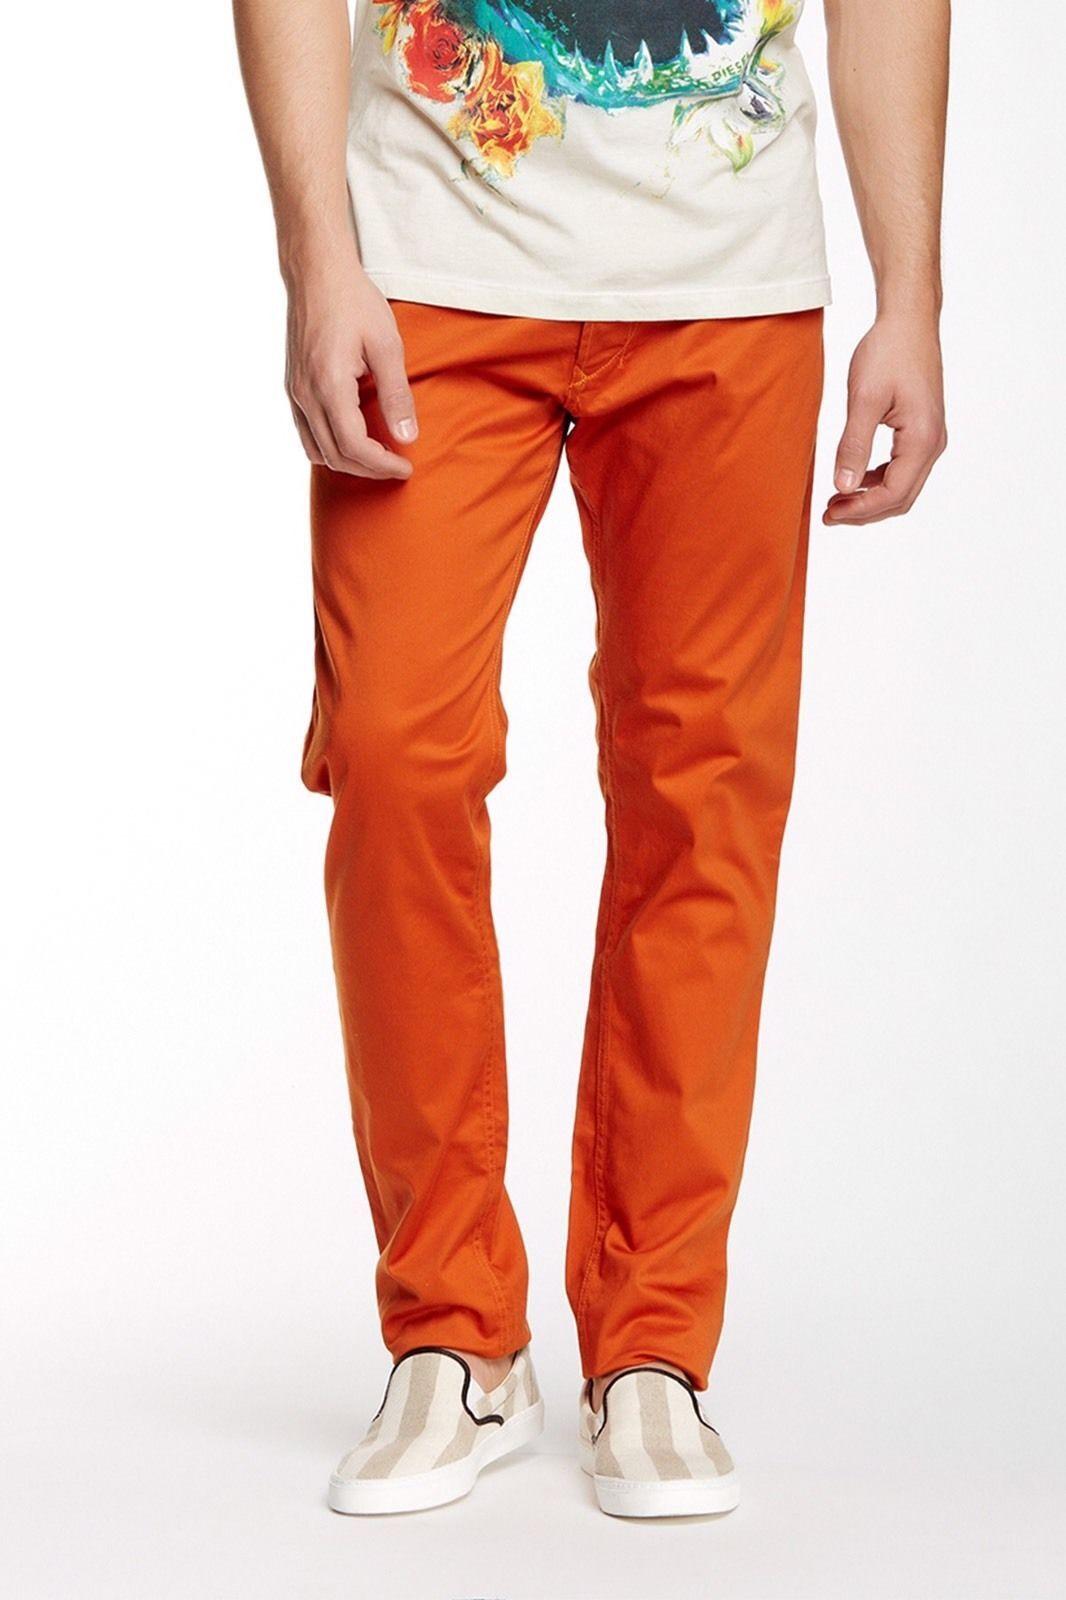 NEW Diesel TEPPHAR-A Trousers in orange W30xL31 Slim-Carred